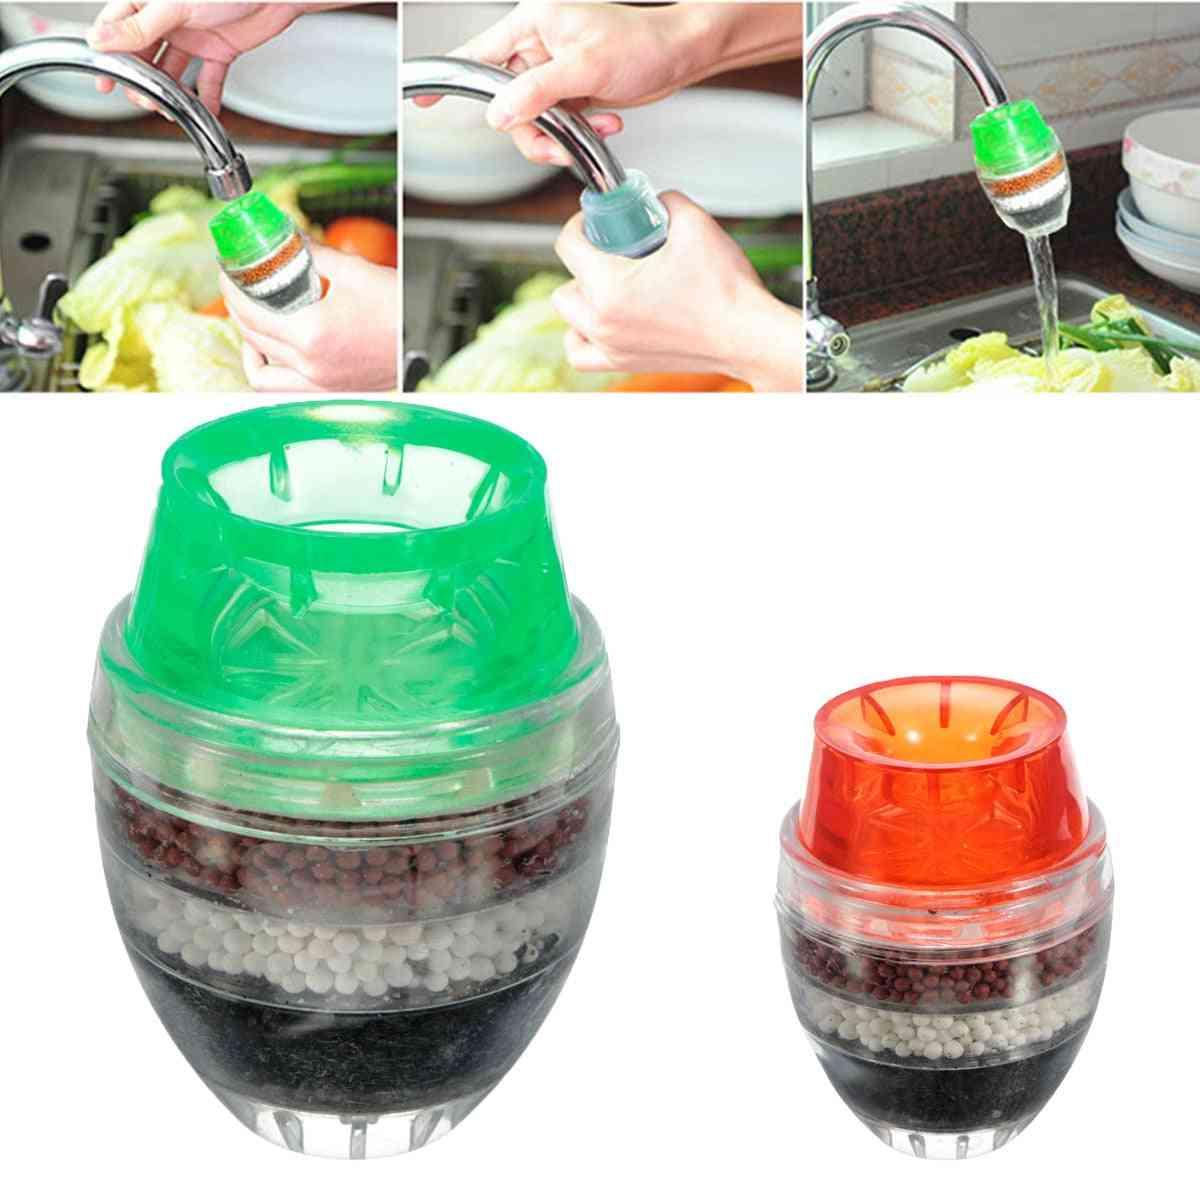 Carbon Faucet Mini Tap Water Clean Filter Purifier